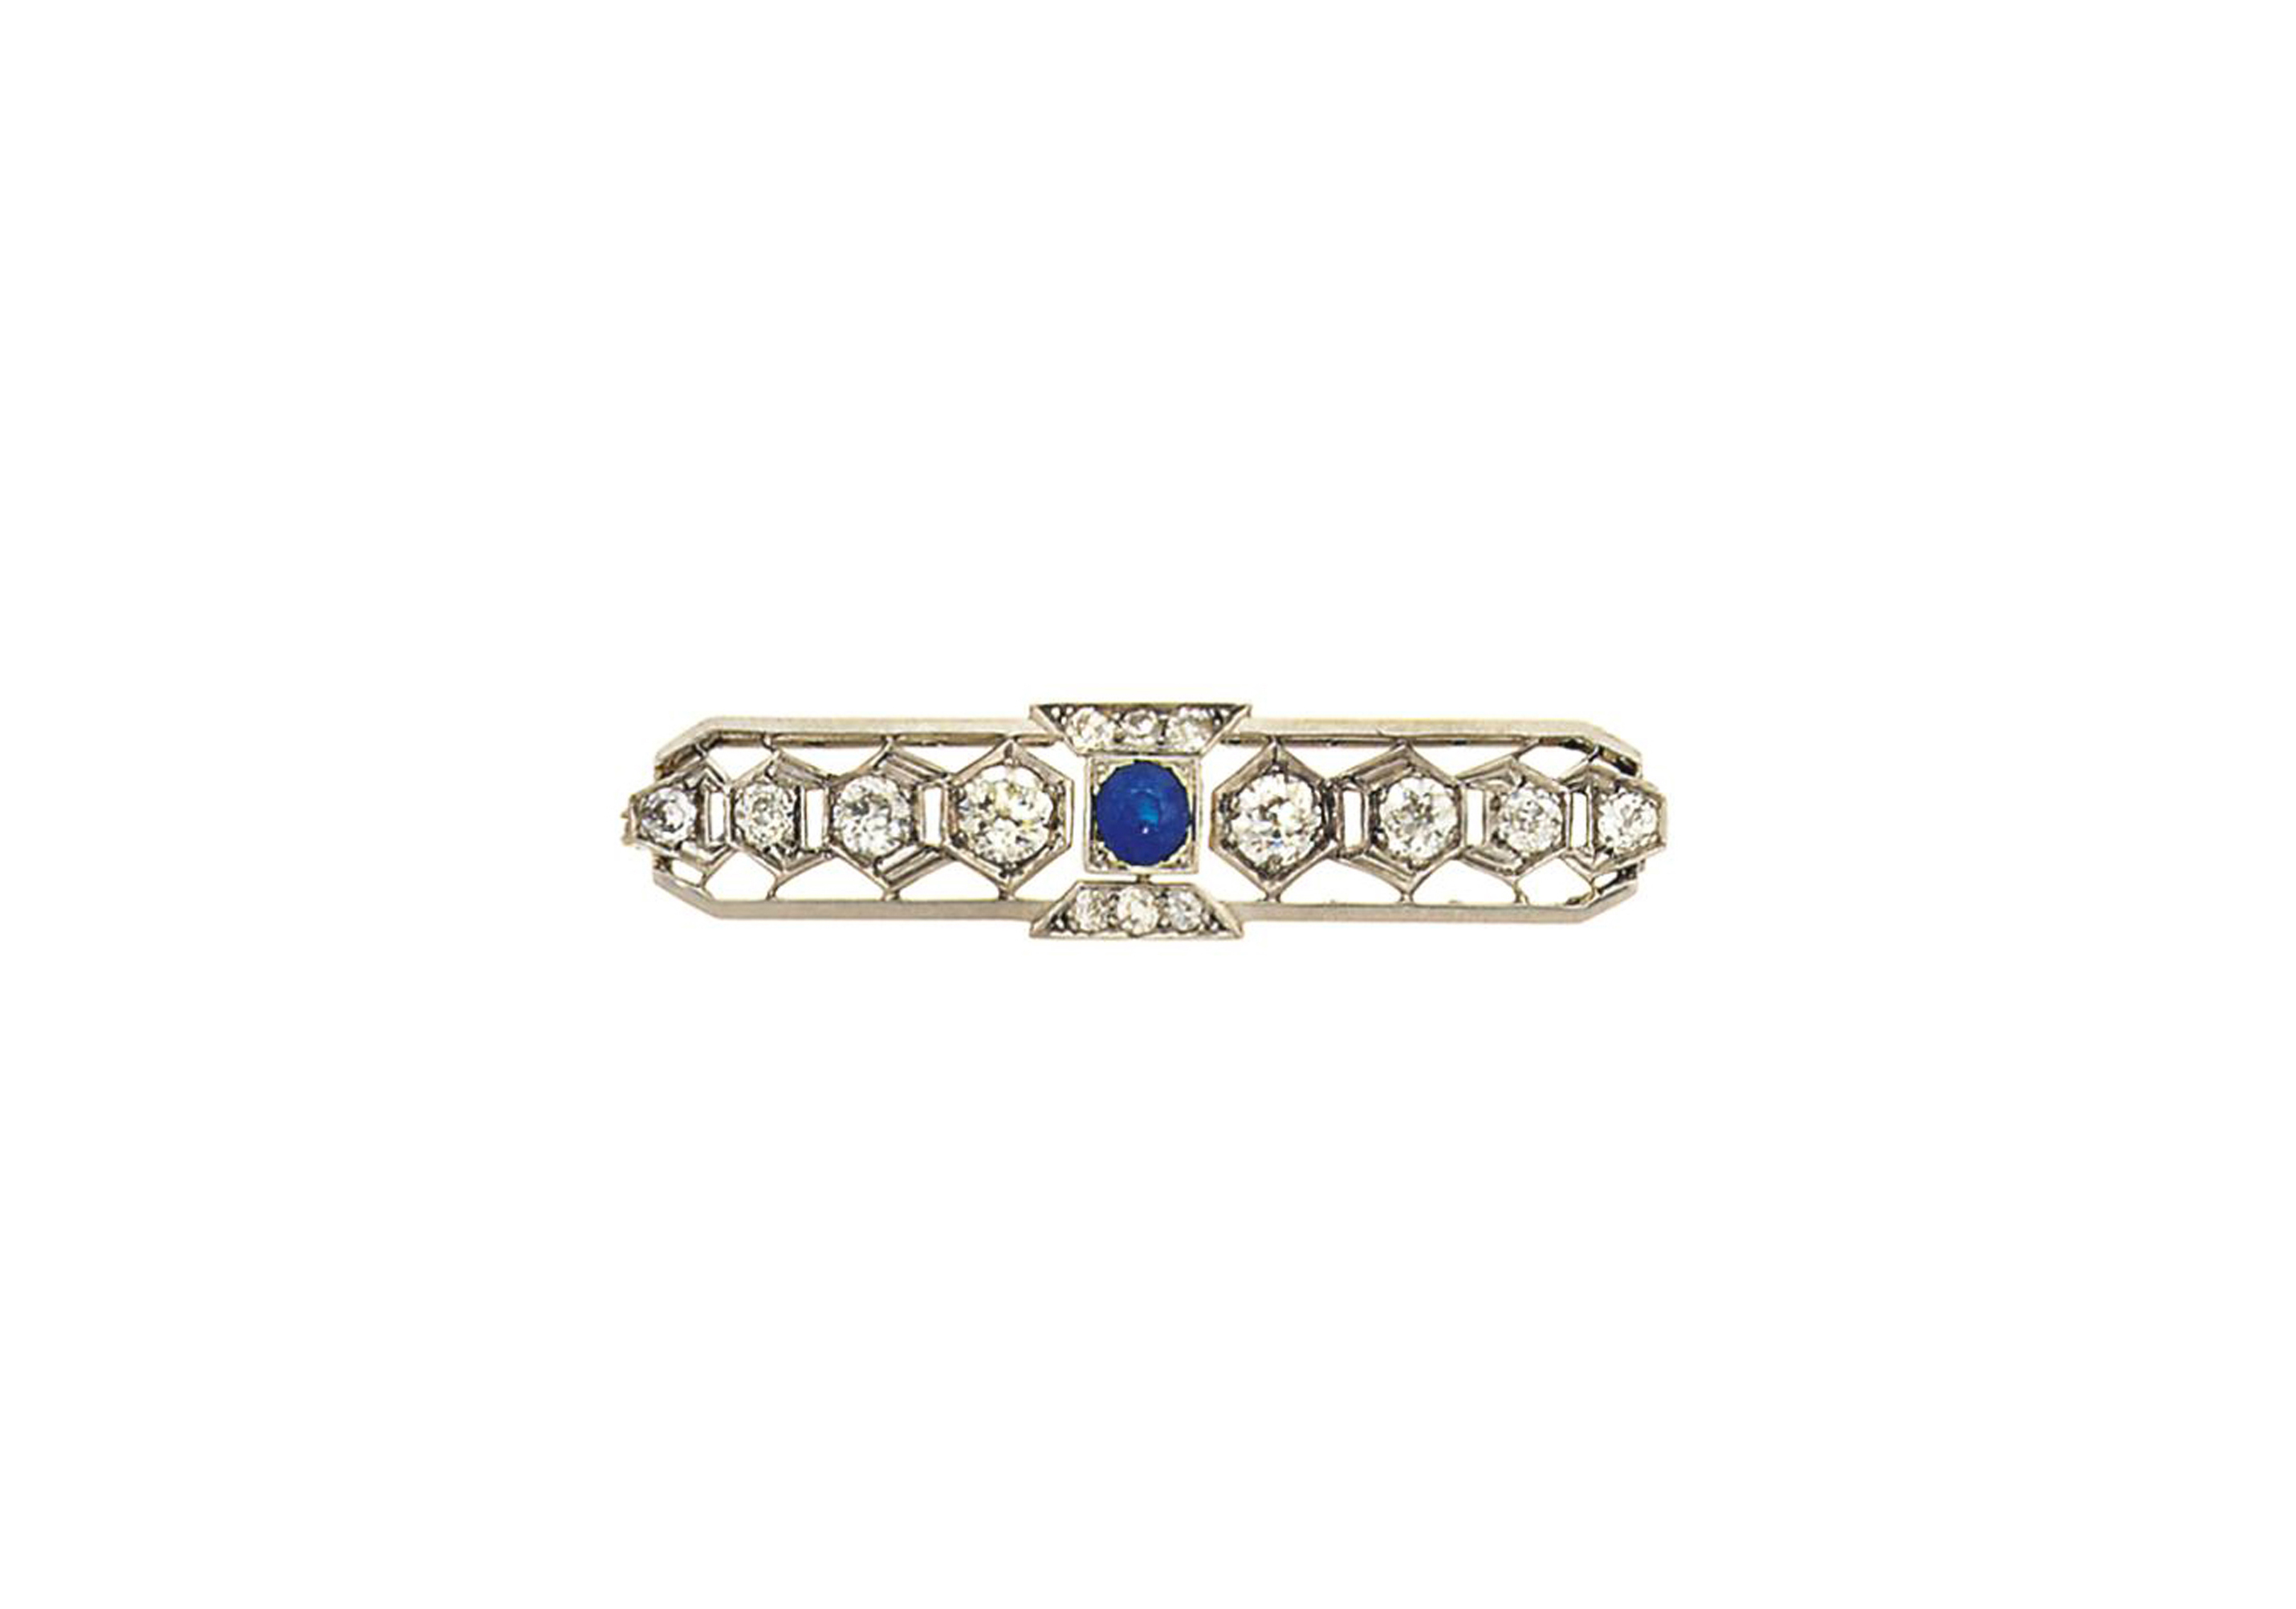 An Art Deco diamond and sapphire brooch